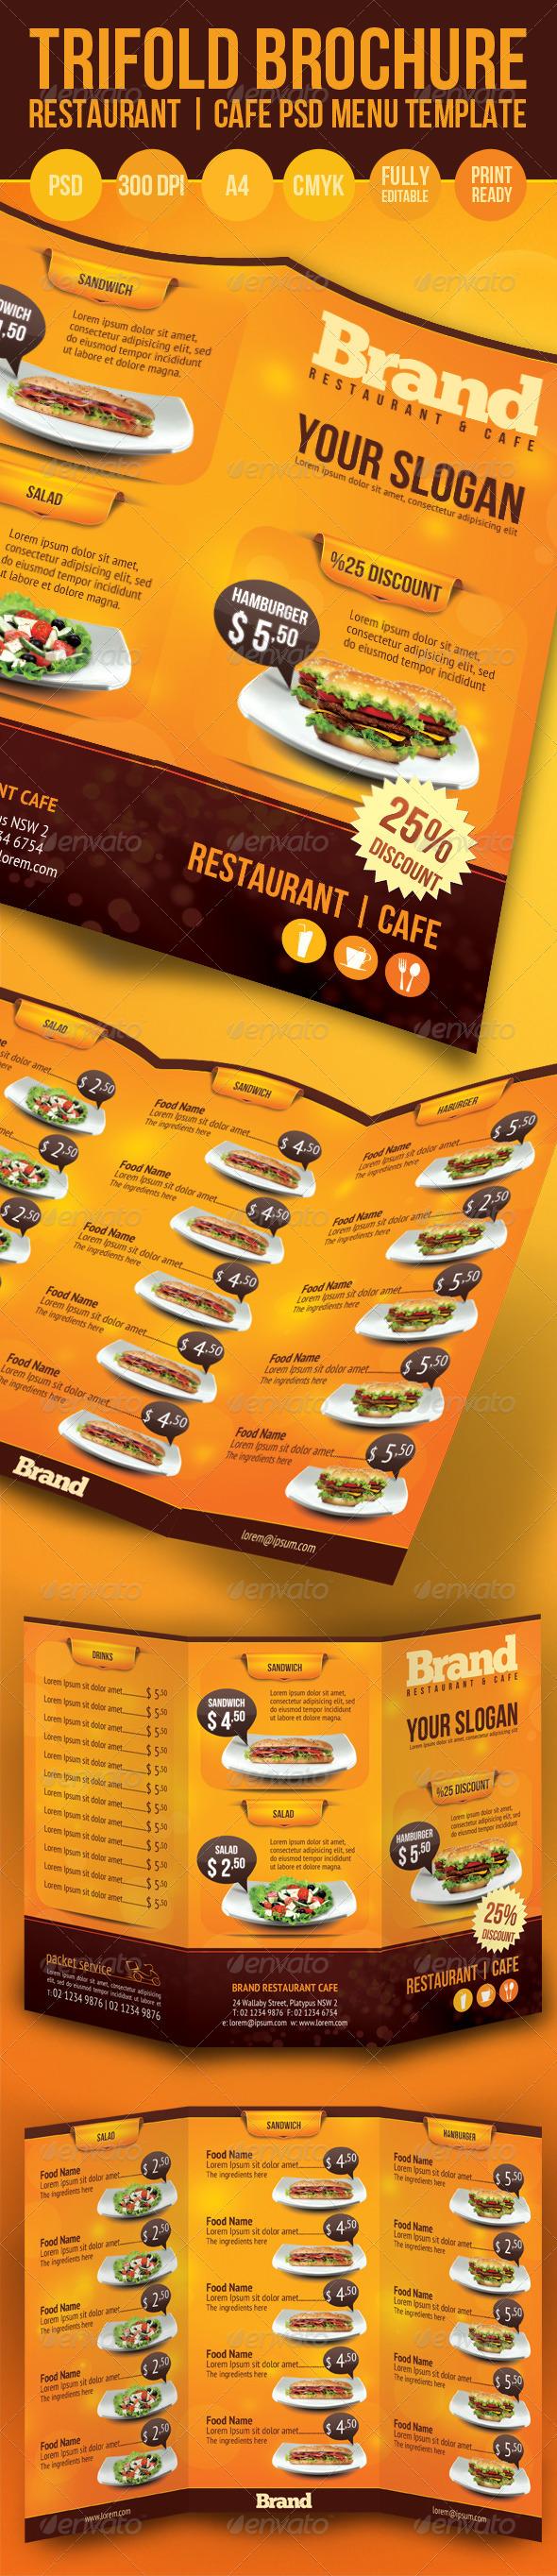 restaurant brochure template - trifold brochure restaurant cafe menu psd template cafe